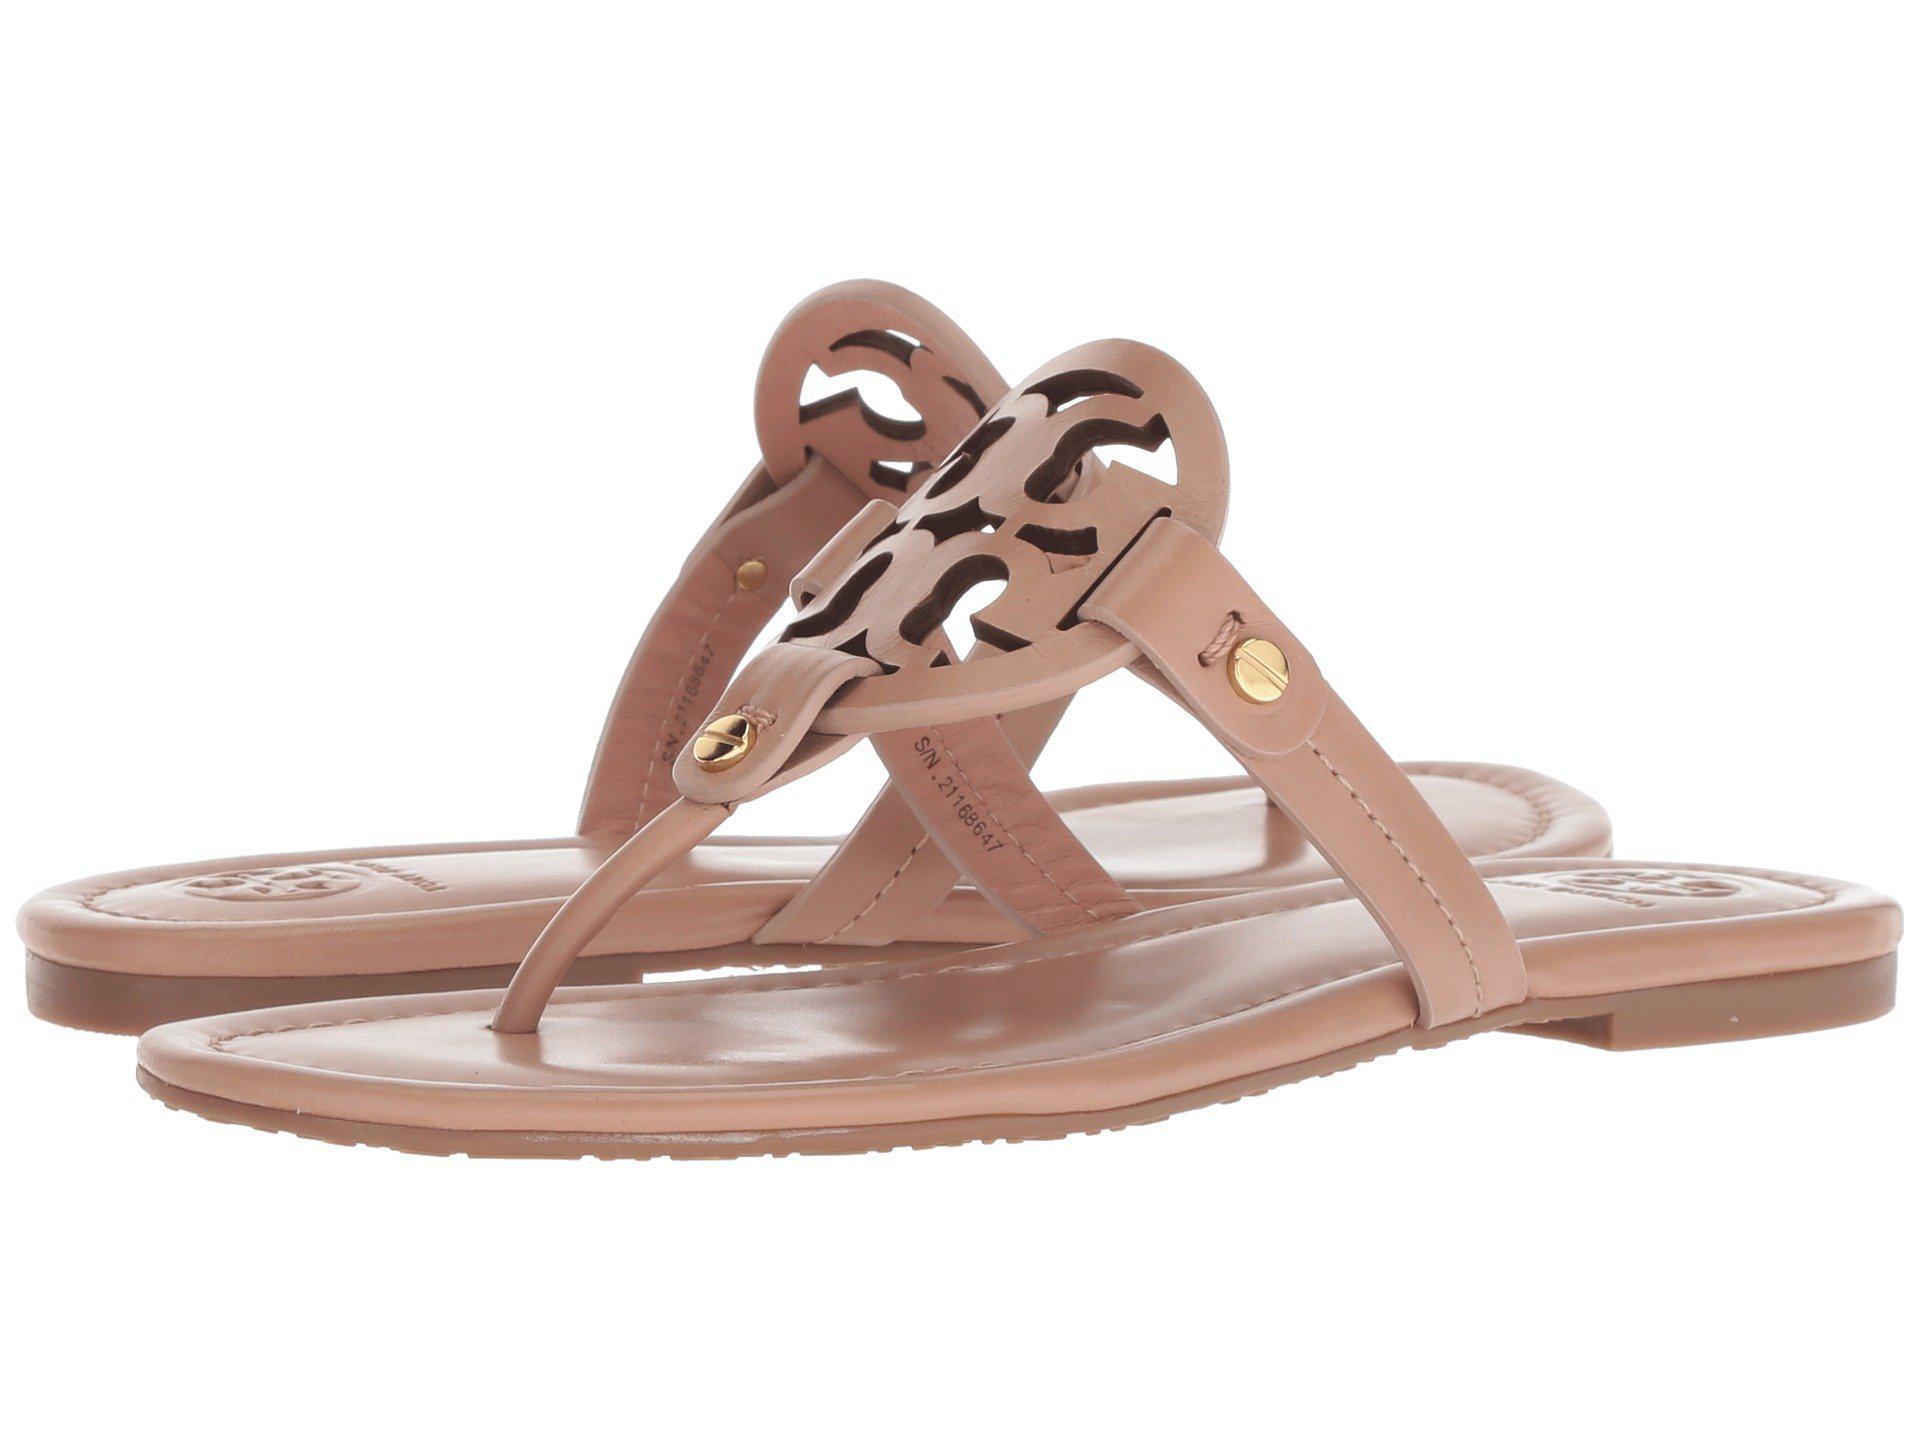 3f060ab2e Lyst - Tory Burch Miller Flip Flop Sandal (light Makeup) Women s Shoes